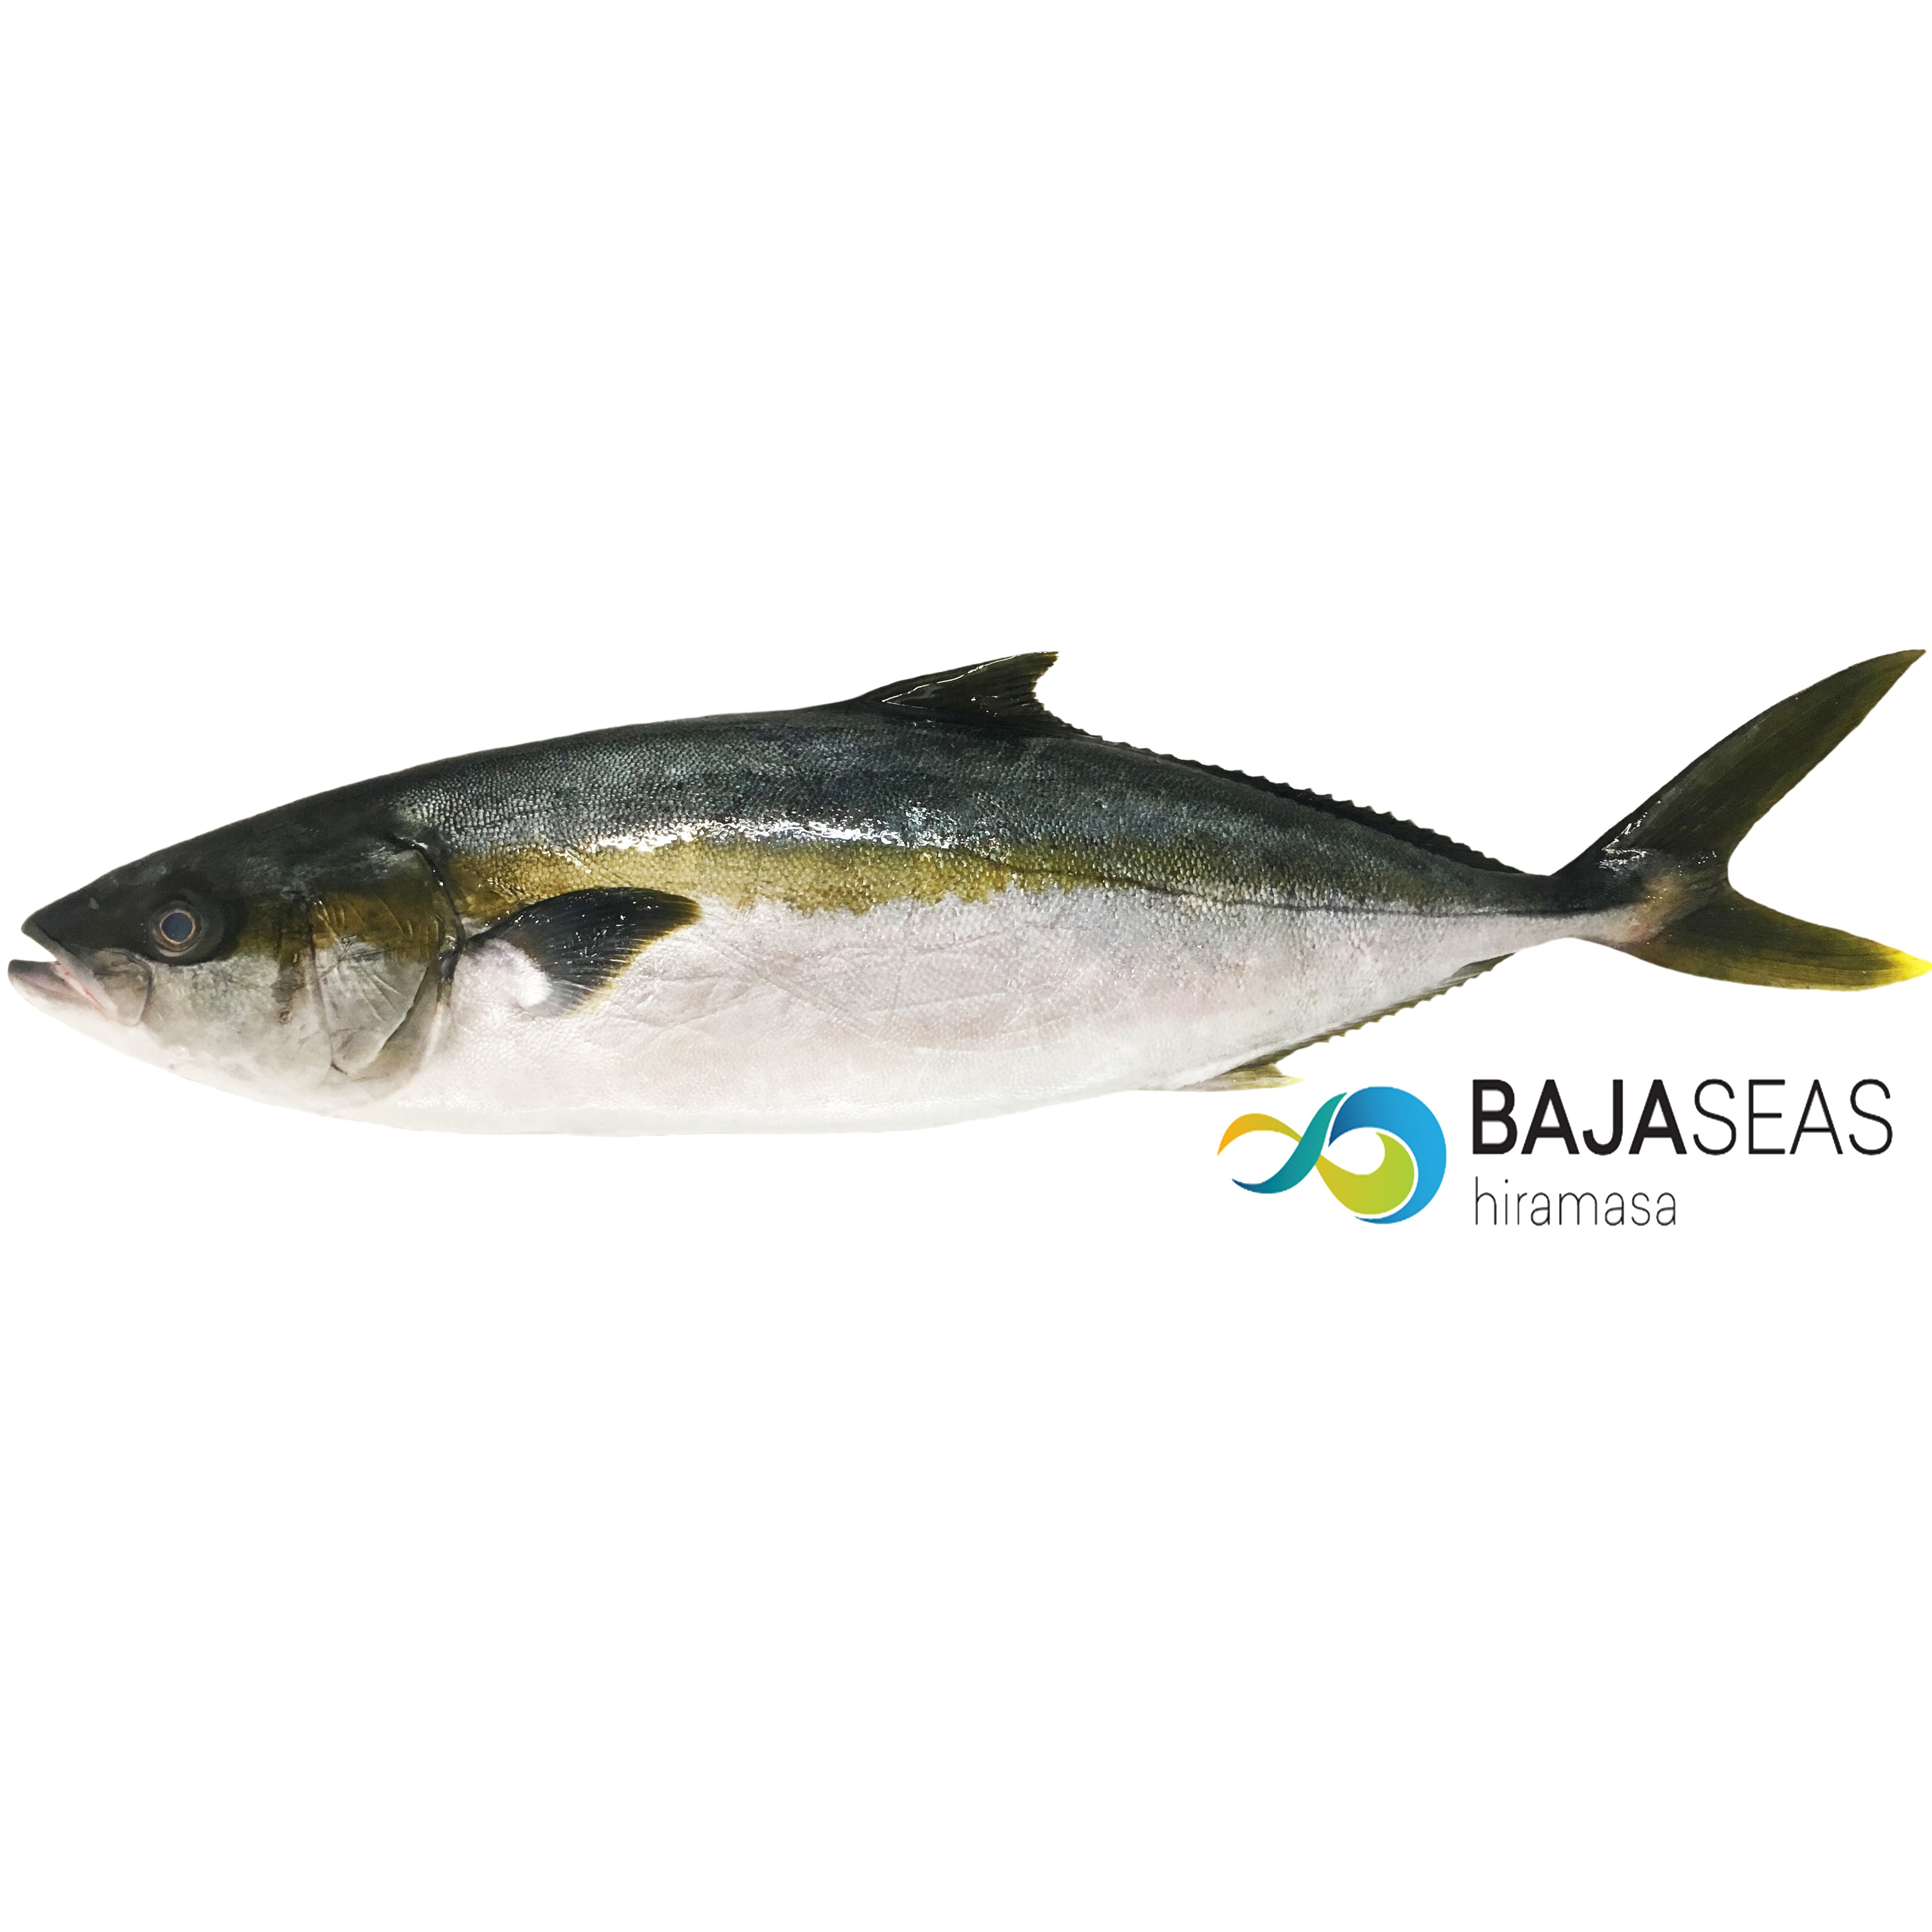 Hiramasa with Baja Seas Logo